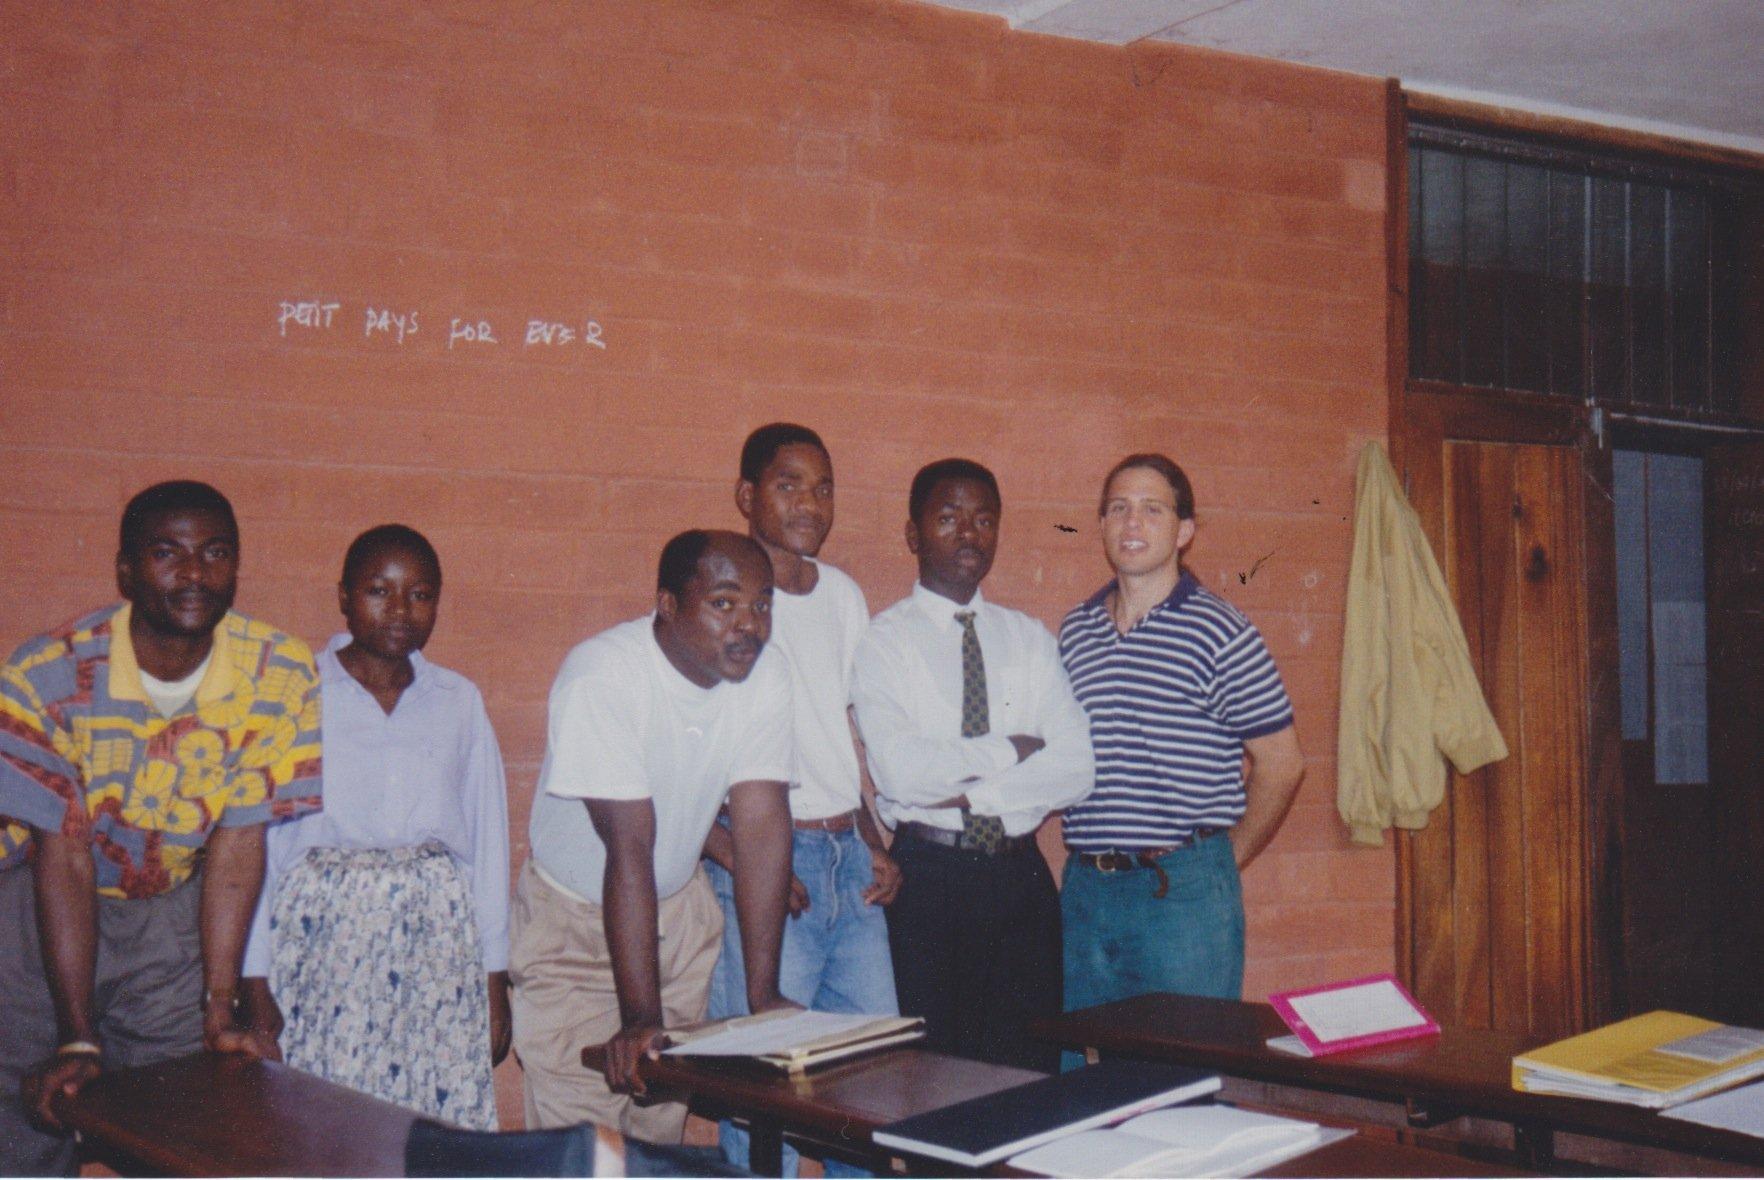 Professor ABEGA Sevérin Cécile, with his students (left to right): Oumarou GBETNKOM, Josephine NSIA, George AKWAH NEBA, Rebecca MVOTO NANGA.